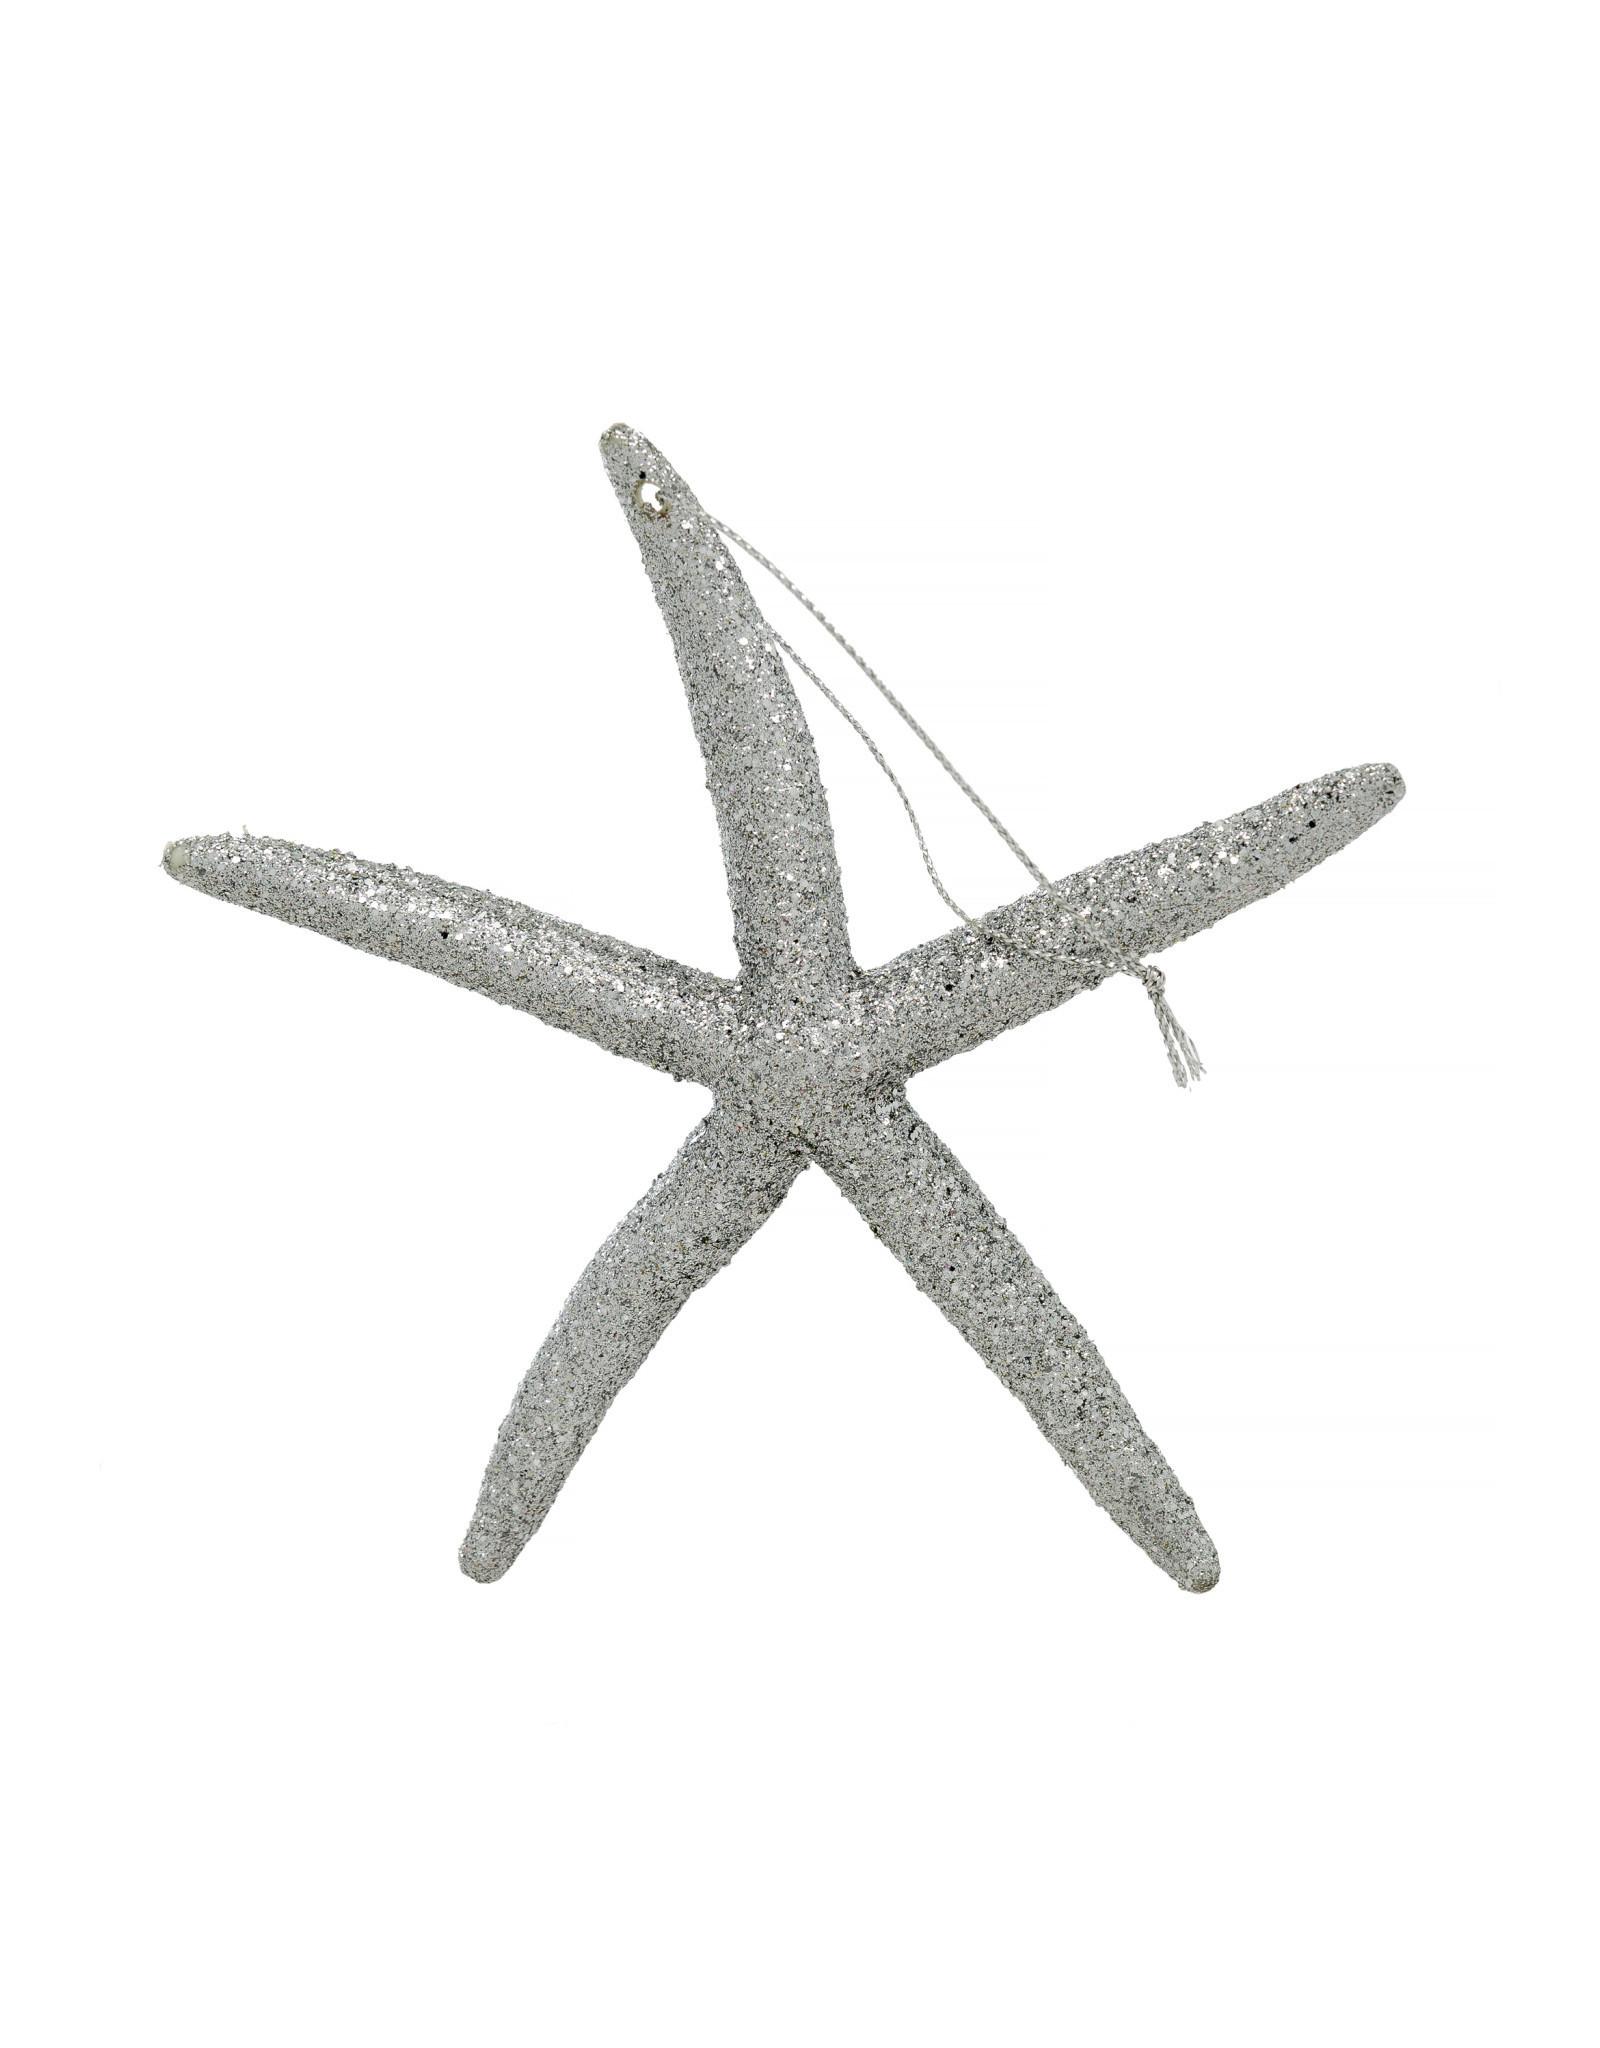 Indaba Sparkly Sea Star Ornament - Silver